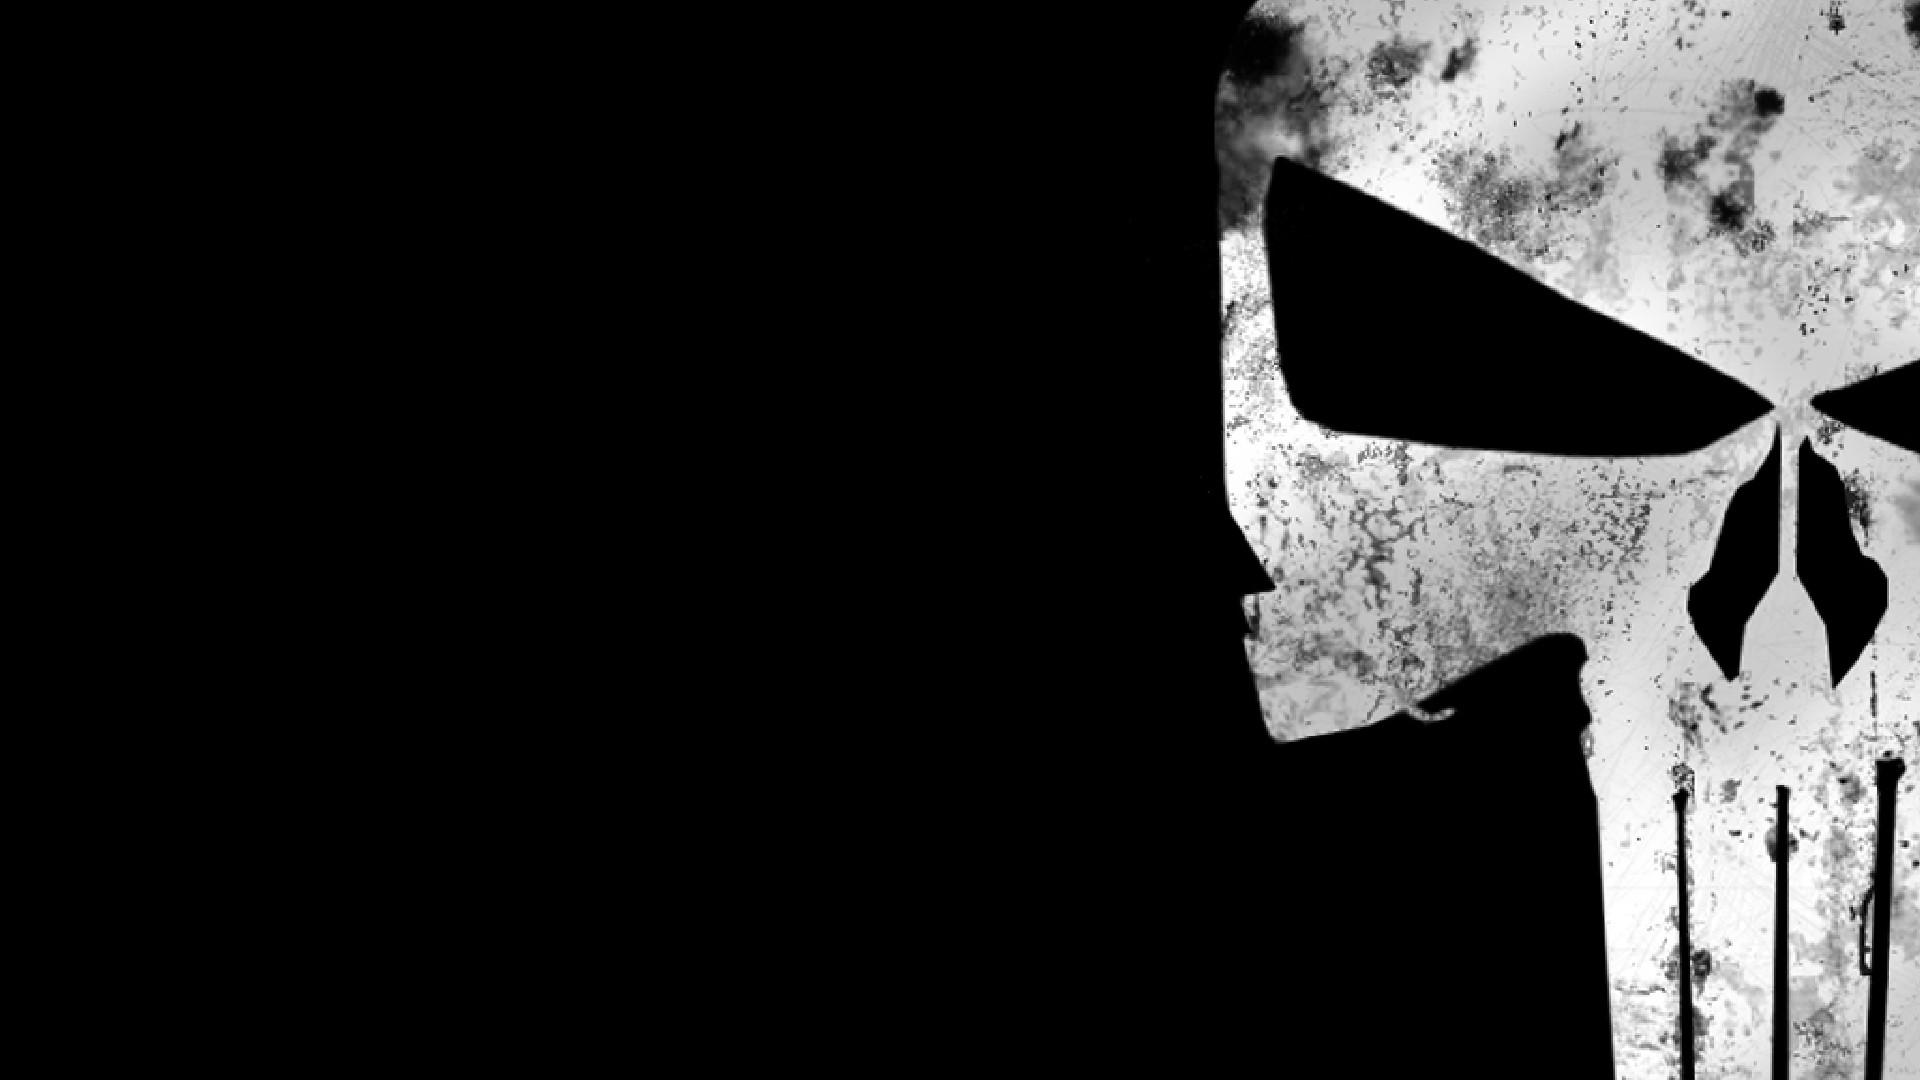 Amazing Wallpaper Marvel Punisher - 129774-cool-the-punisher-wallpaper-1920x1080  Image_4857.jpg